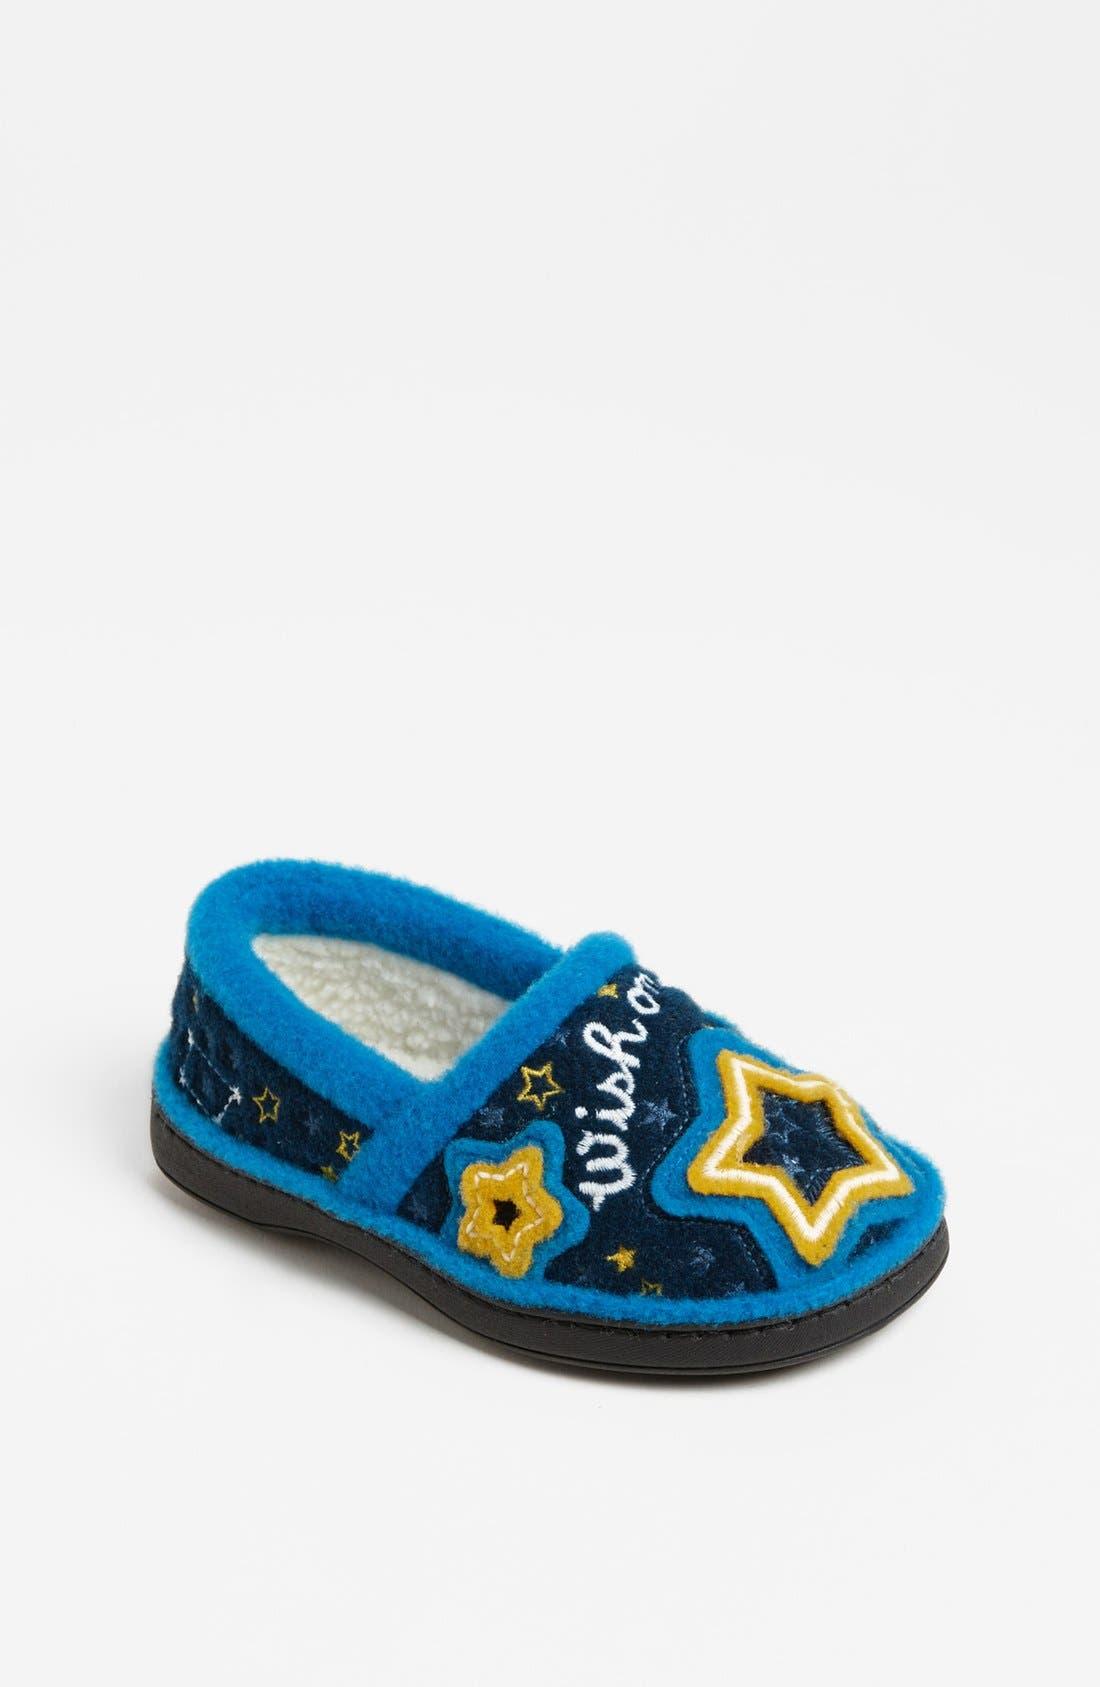 Alternate Image 1 Selected - Acorn 'Glow Star' Slipper (Toddler, Little Kid & Big Kid)